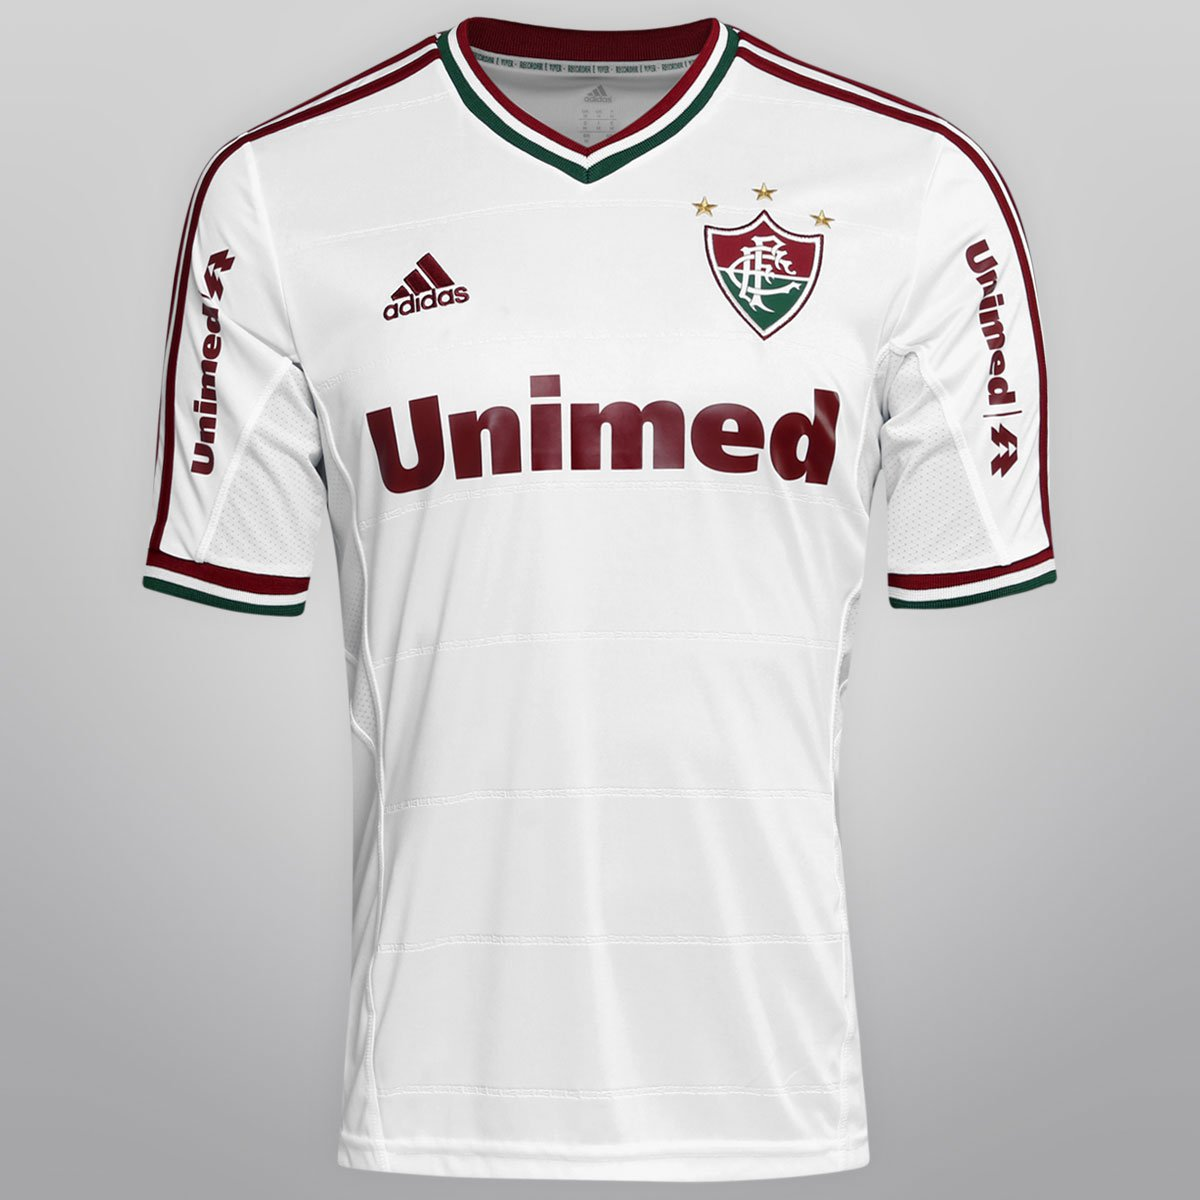 Camisa Adidas Fluminense II 13 14 s nº - Compre Agora  68677db059018